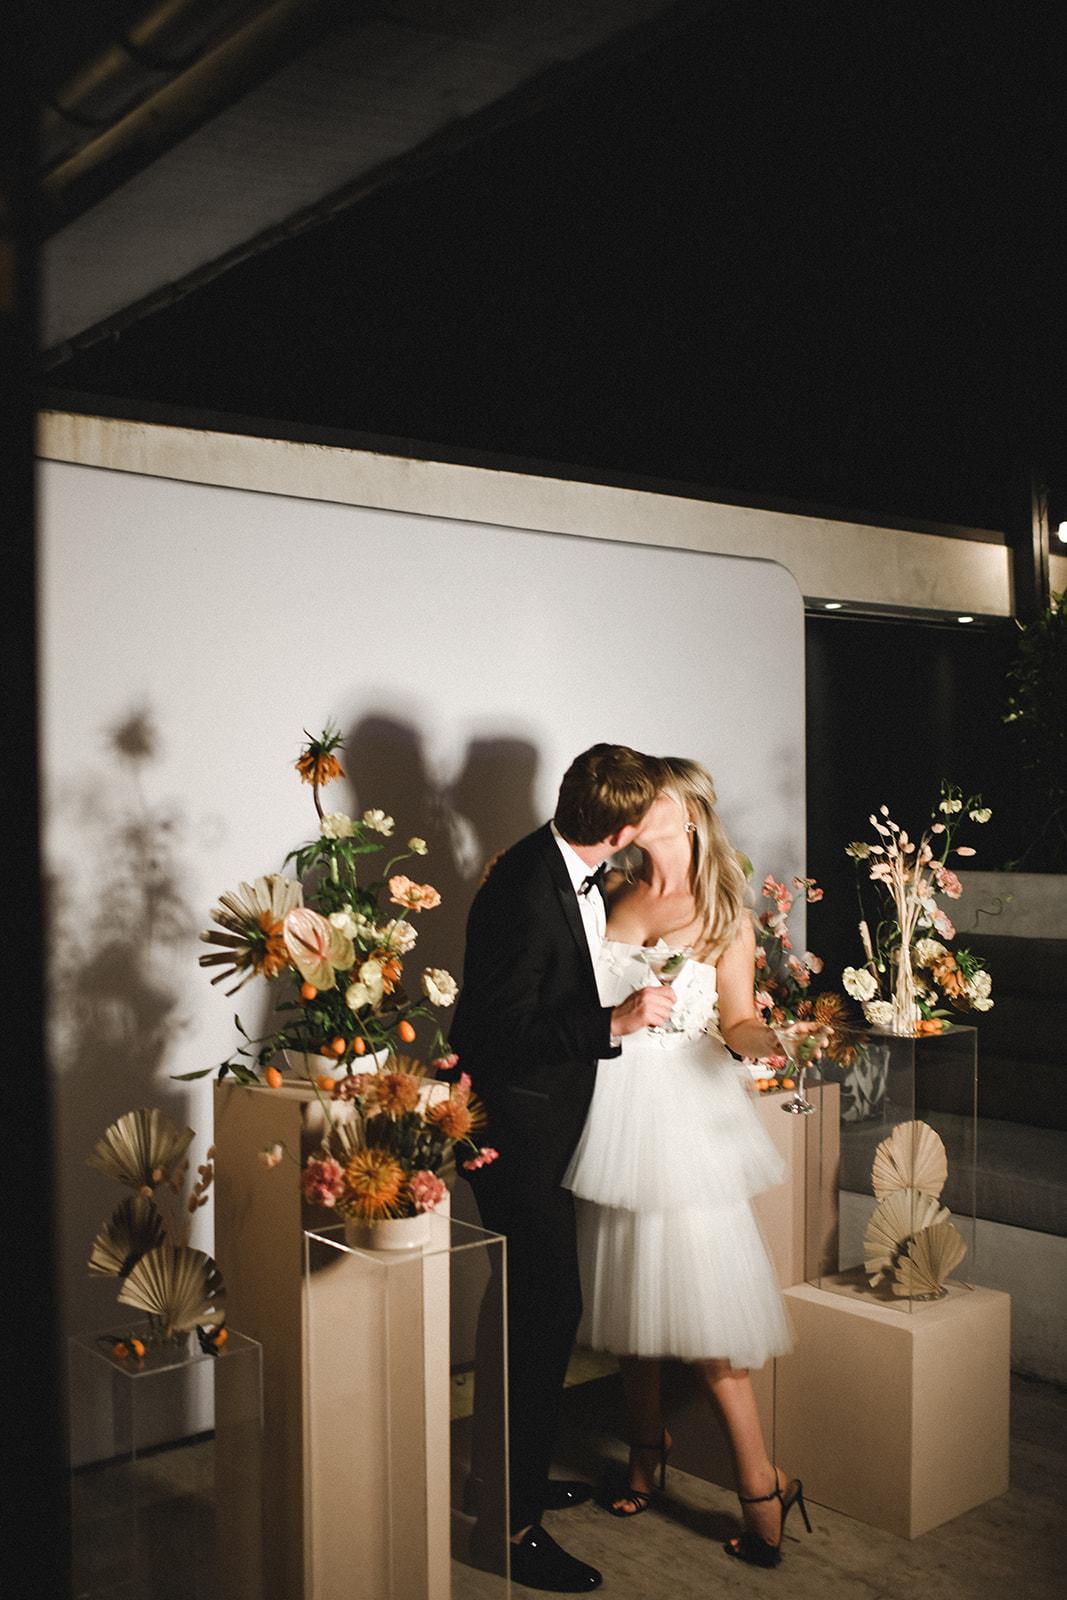 KL_WEDDING_0794.jpg